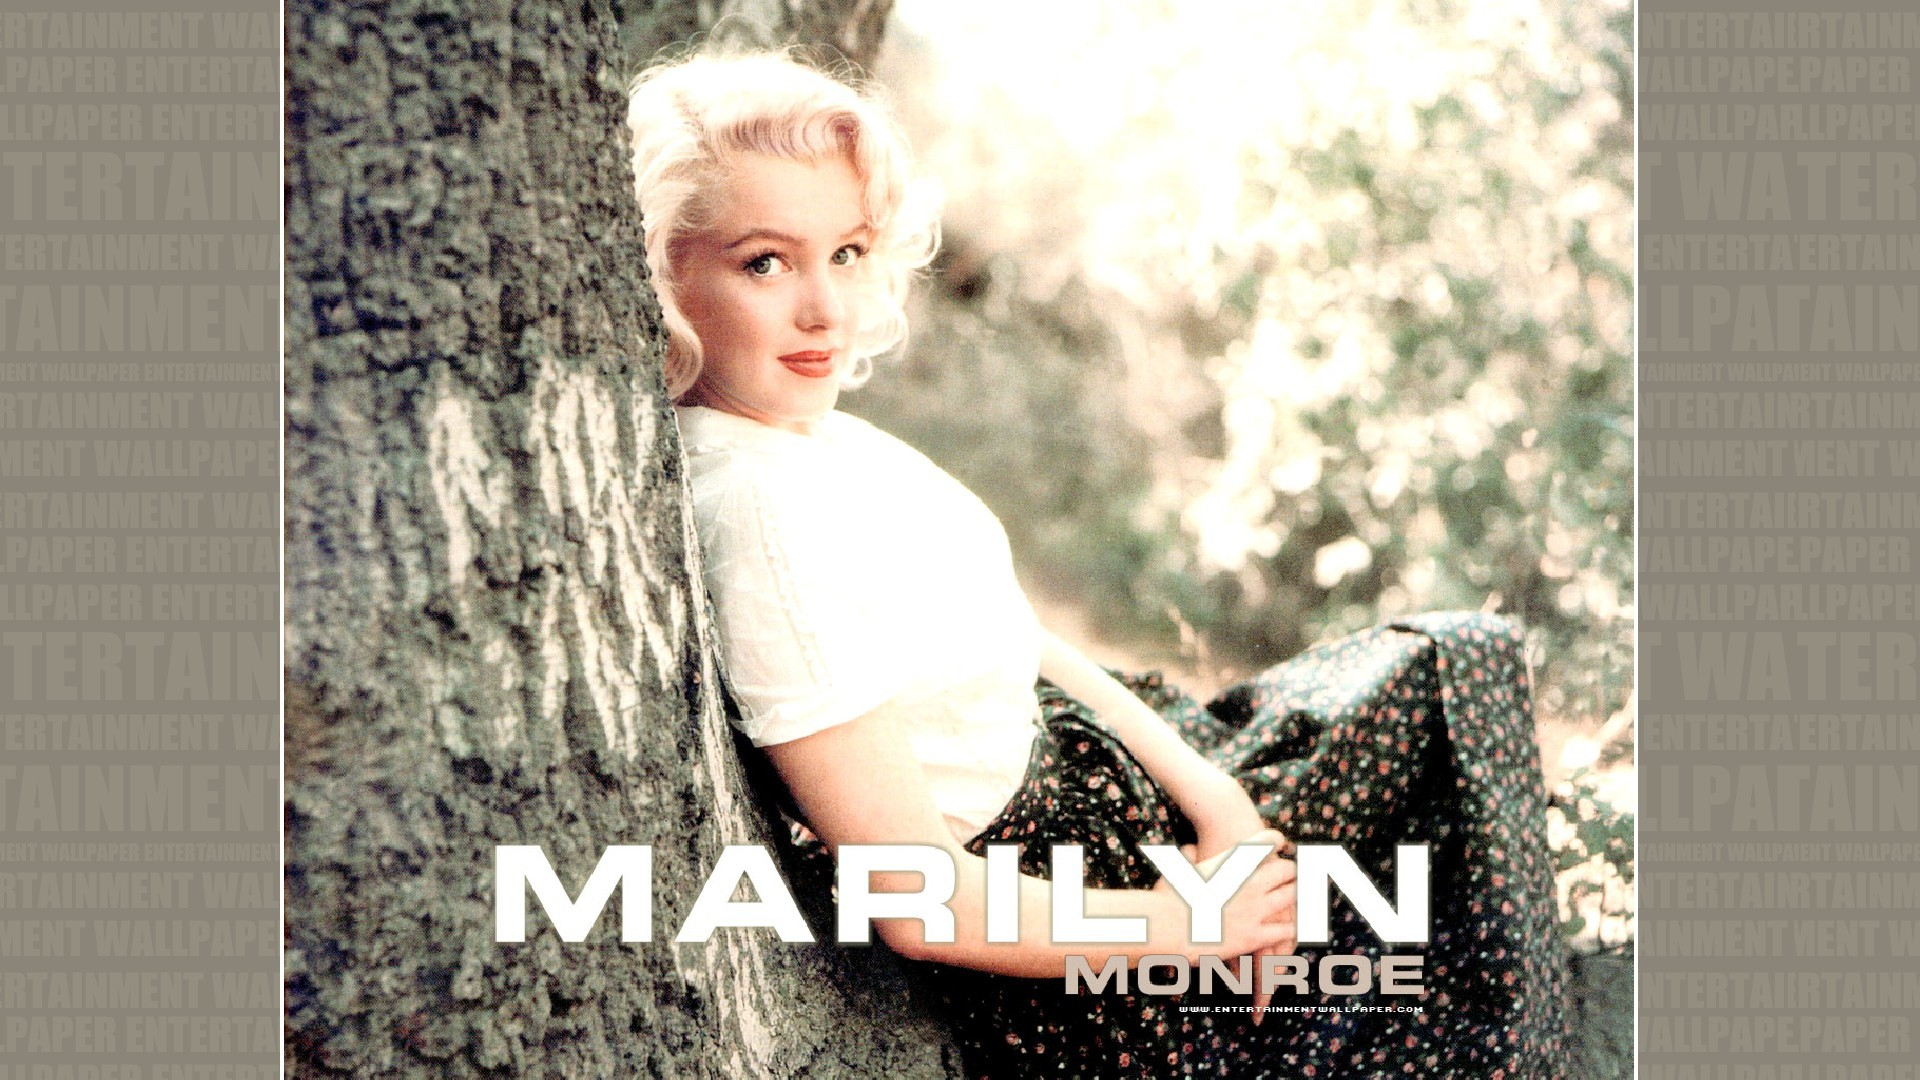 Res: 1920x1080, Marilyn Monroe Wallpaper - Original size, download now.